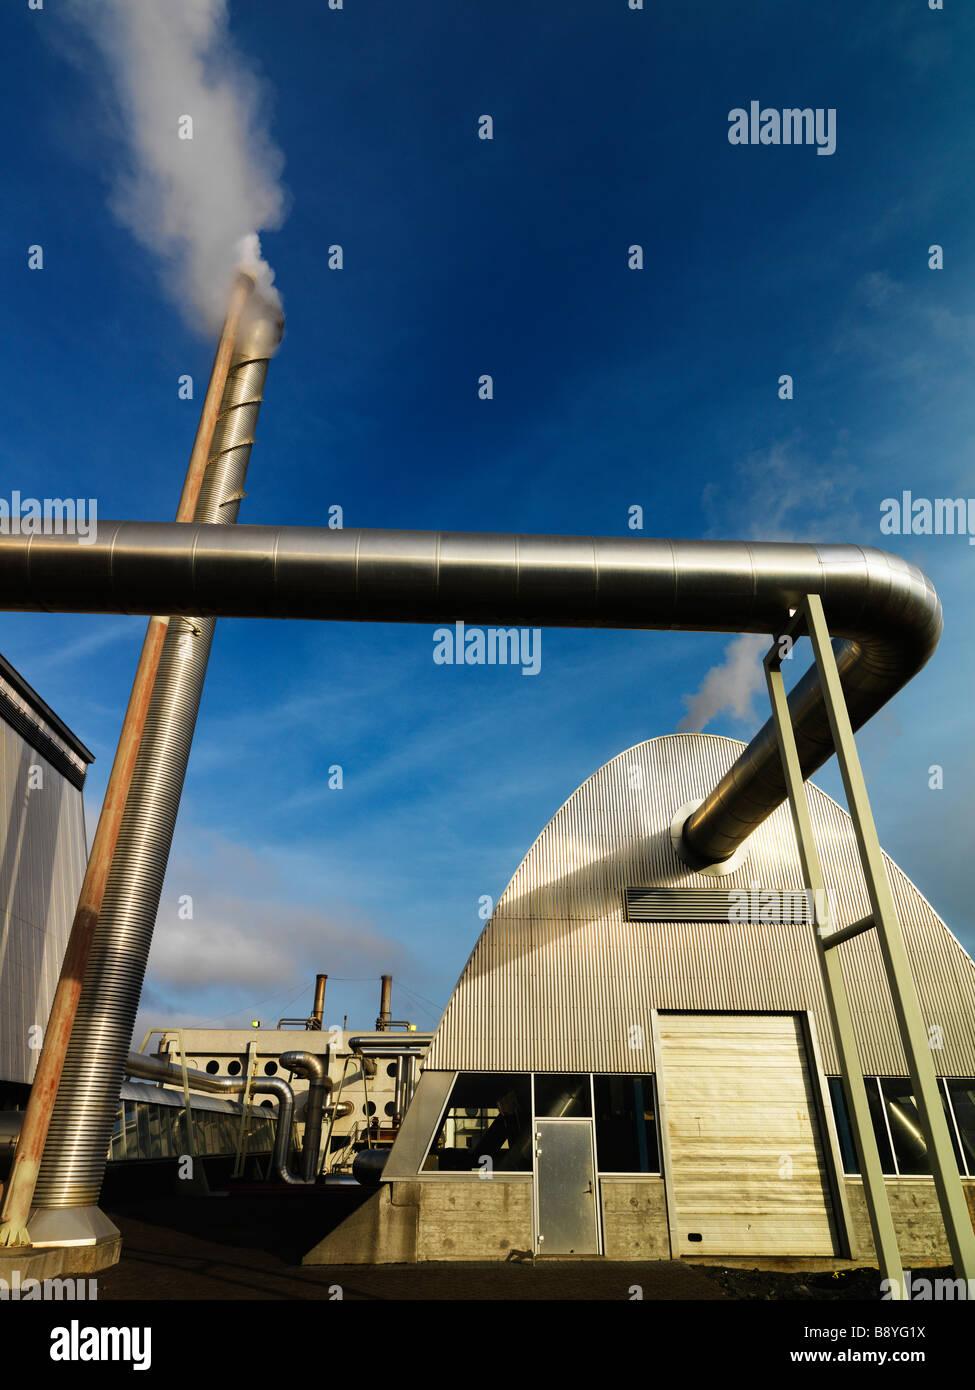 Geothermic power station Iceland. - Stock Image